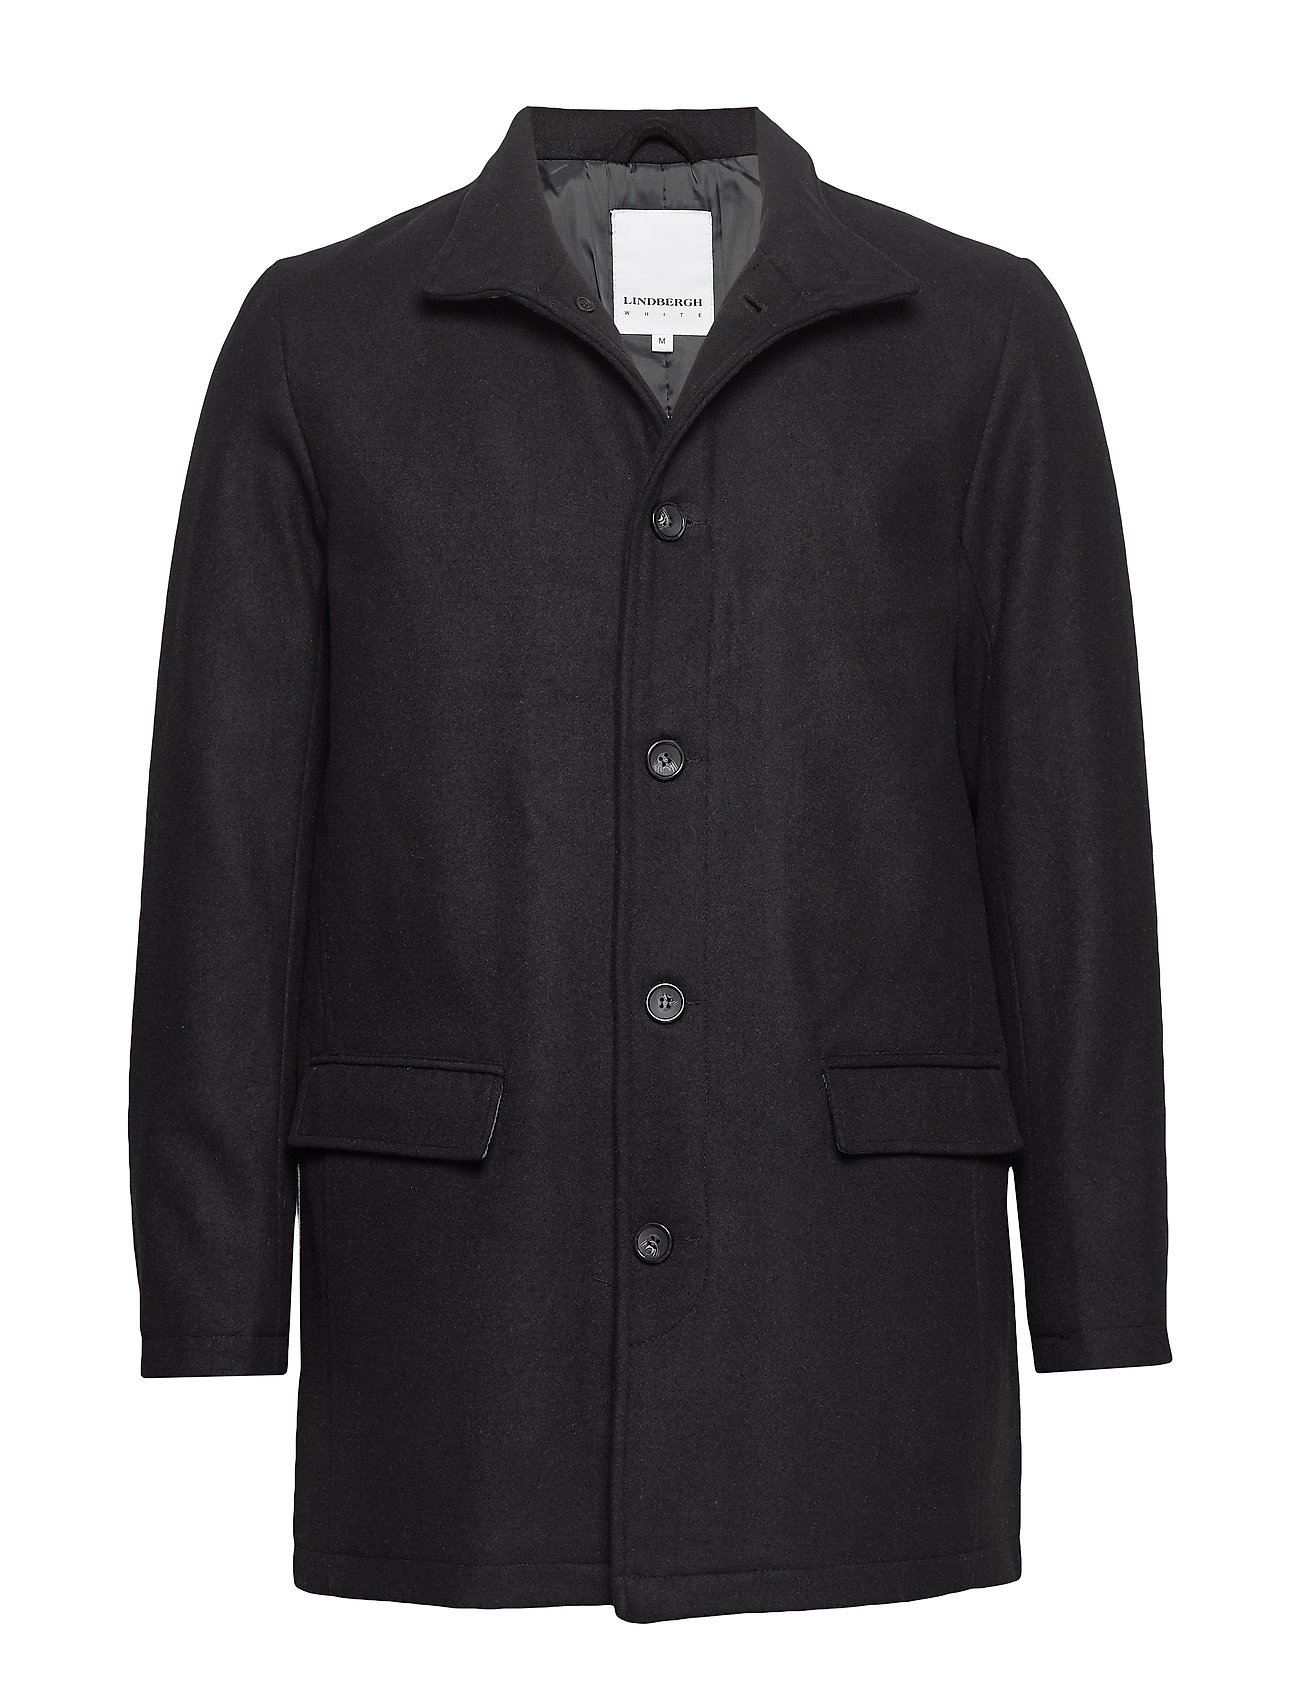 Lindbergh Coat w stand up collar - BLACK